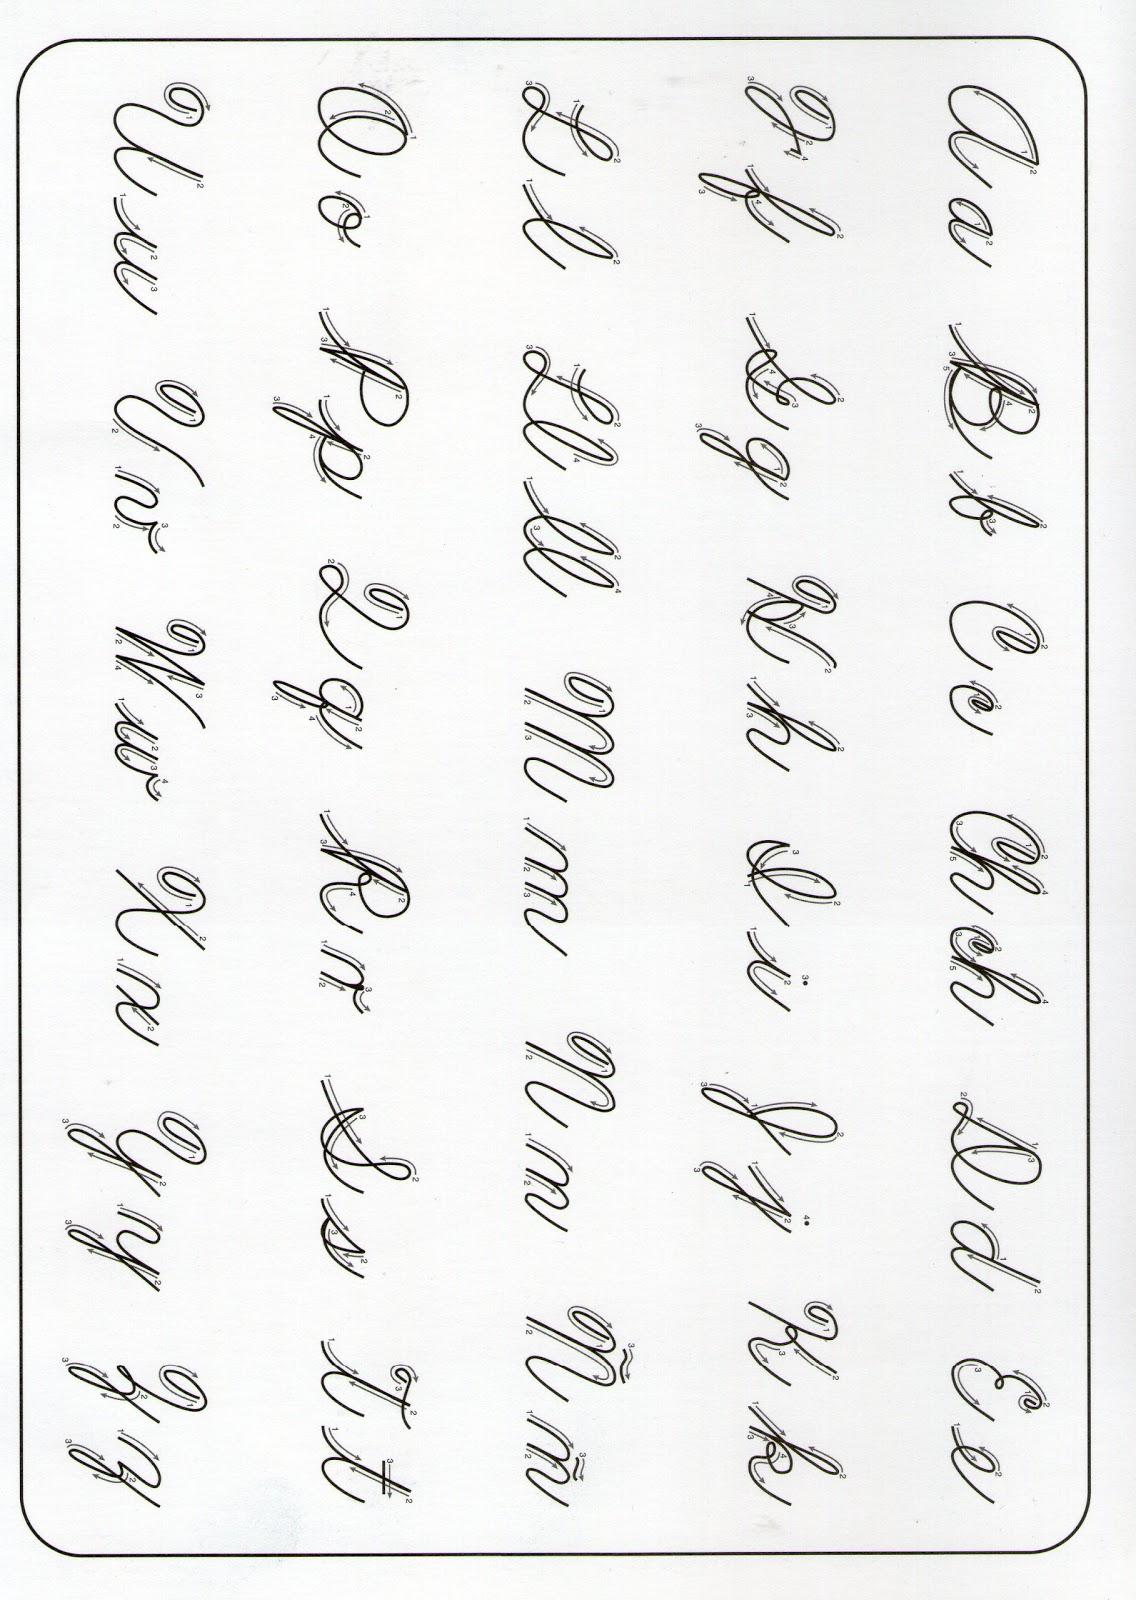 netLetra Cursiva Para Imprimir Letras Cholas Graffiti Abecedario